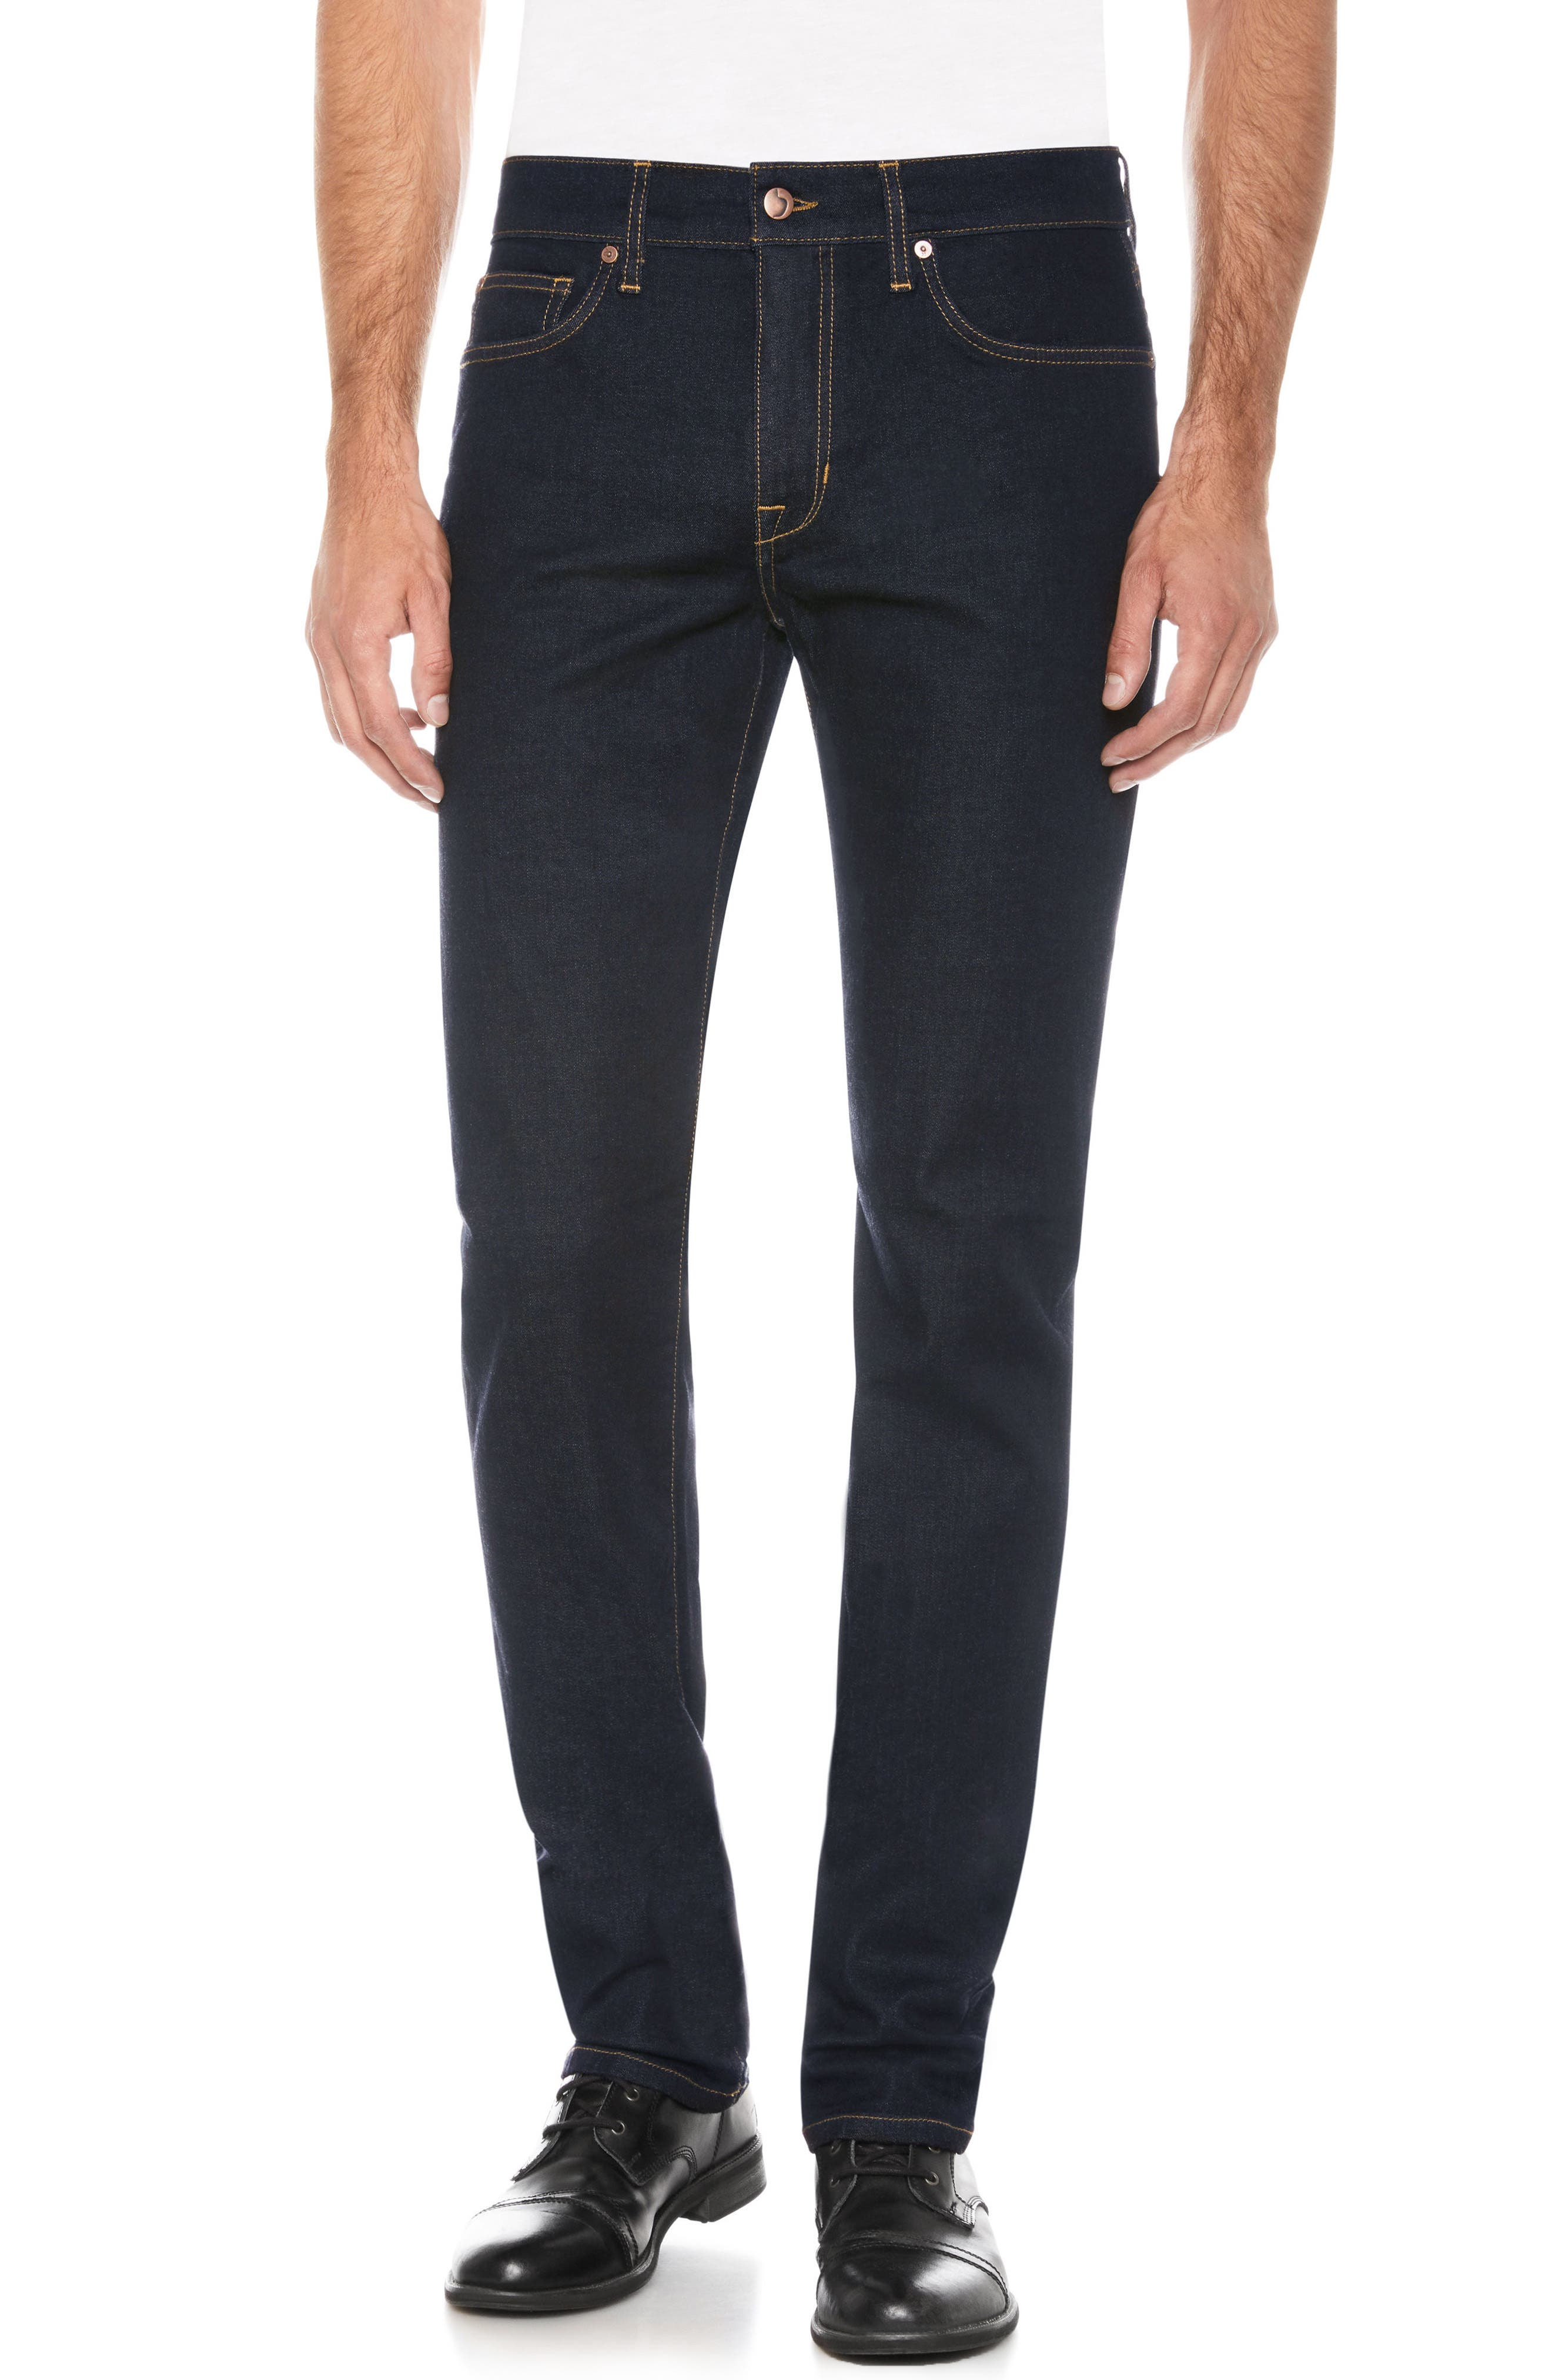 Brixton Slim Straight Fit Jeans,                             Main thumbnail 1, color,                             400